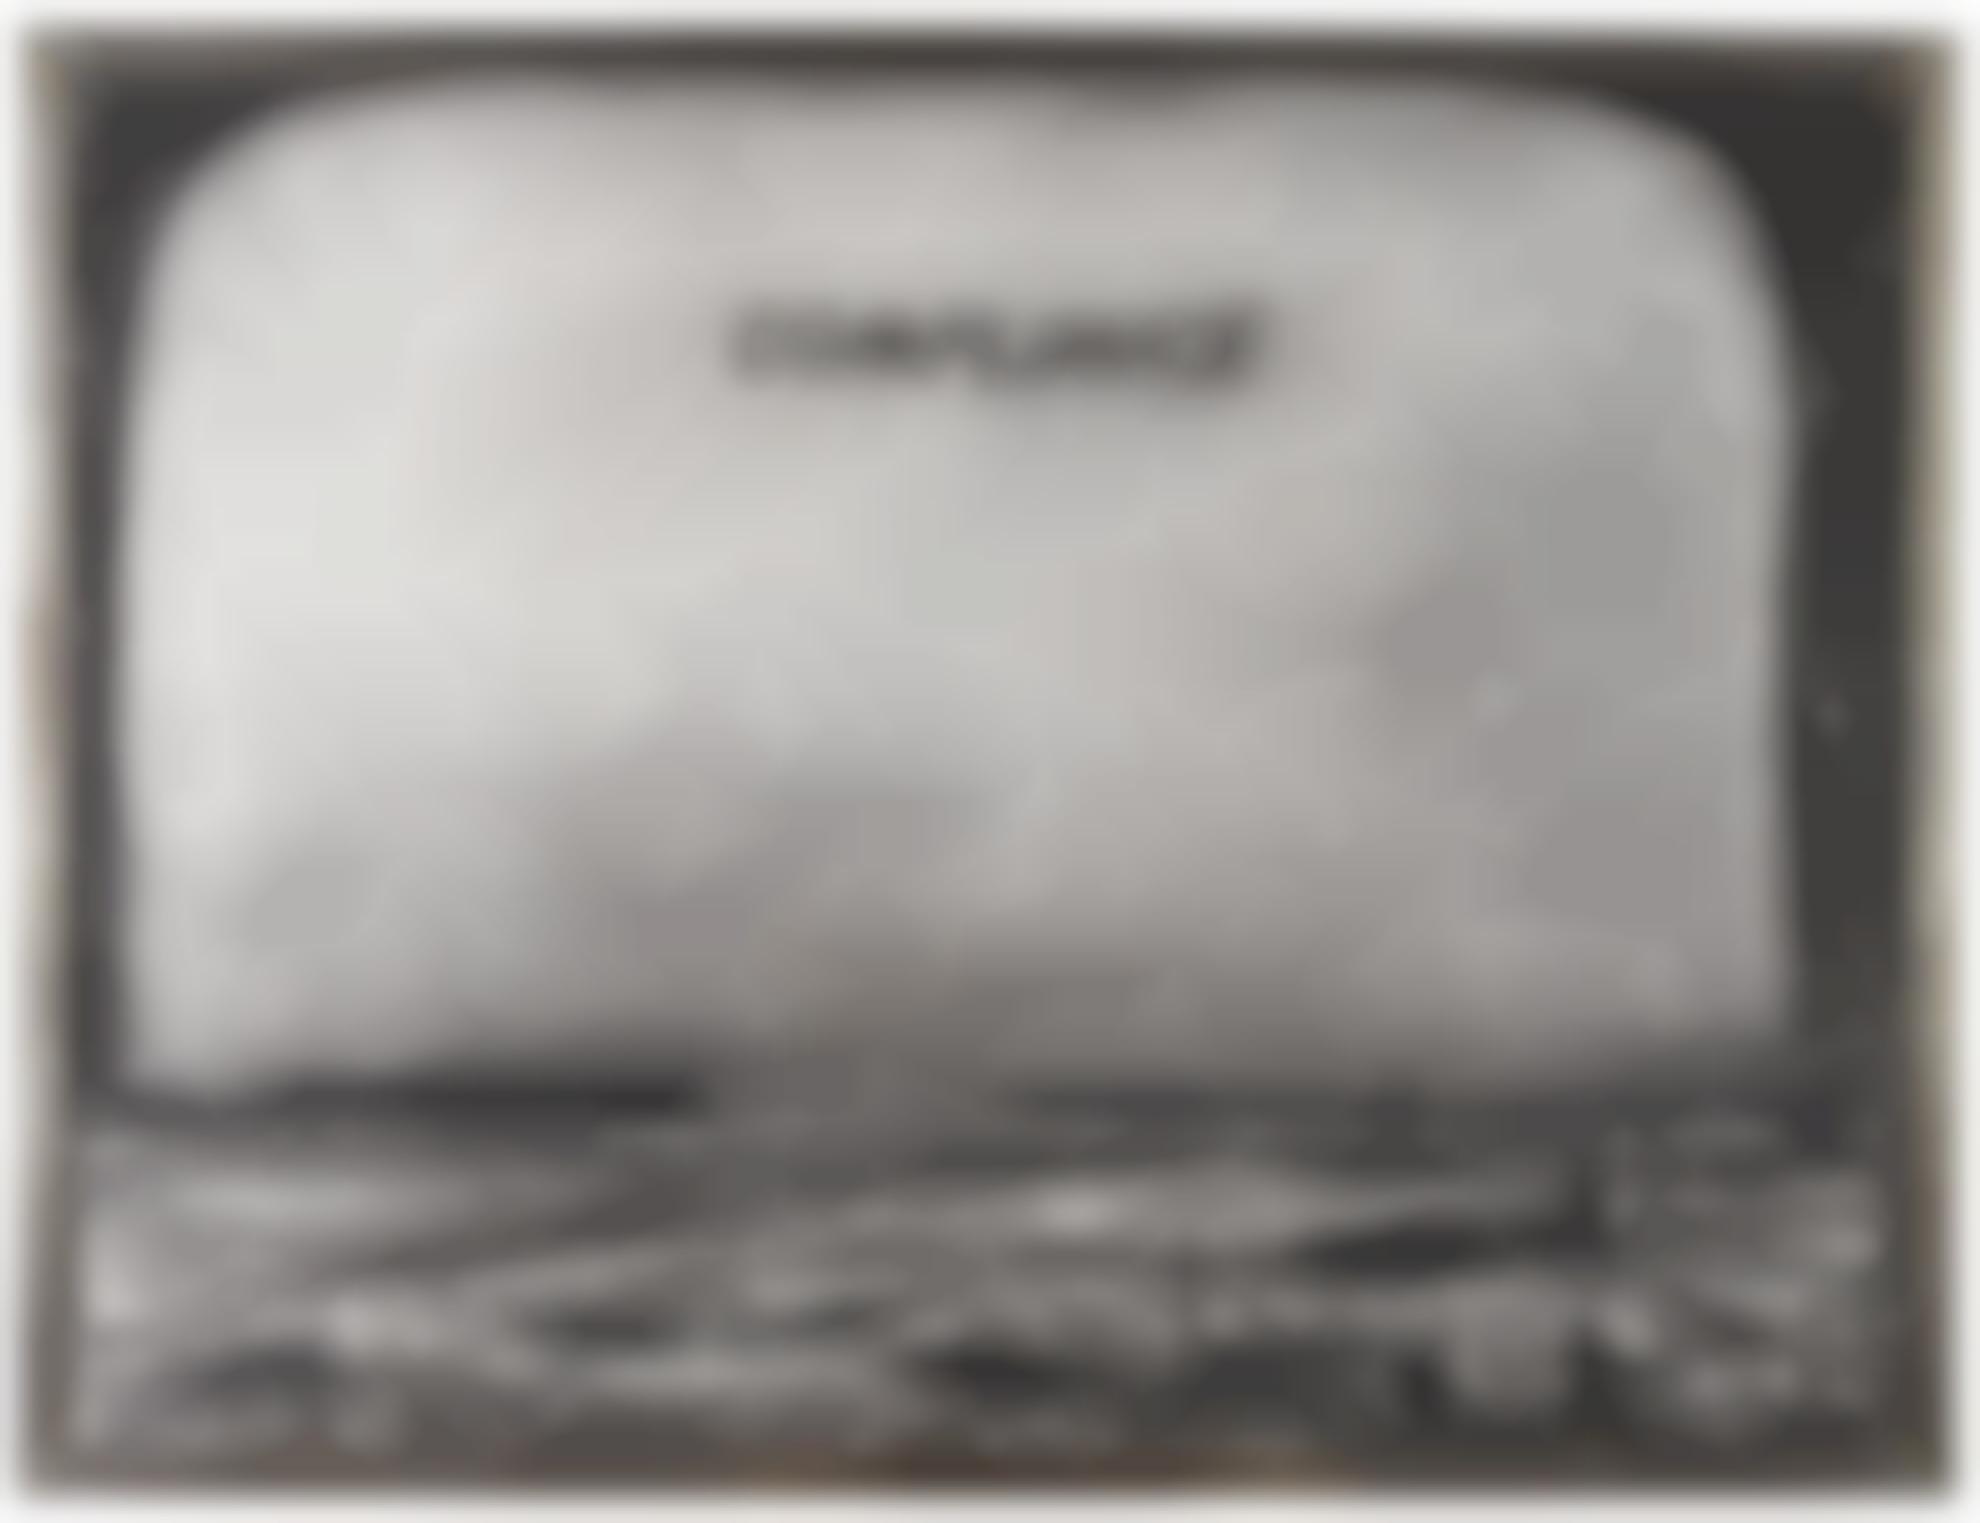 William Kentridge-Compliance (Drawing From Sleeping On Glass)-1999